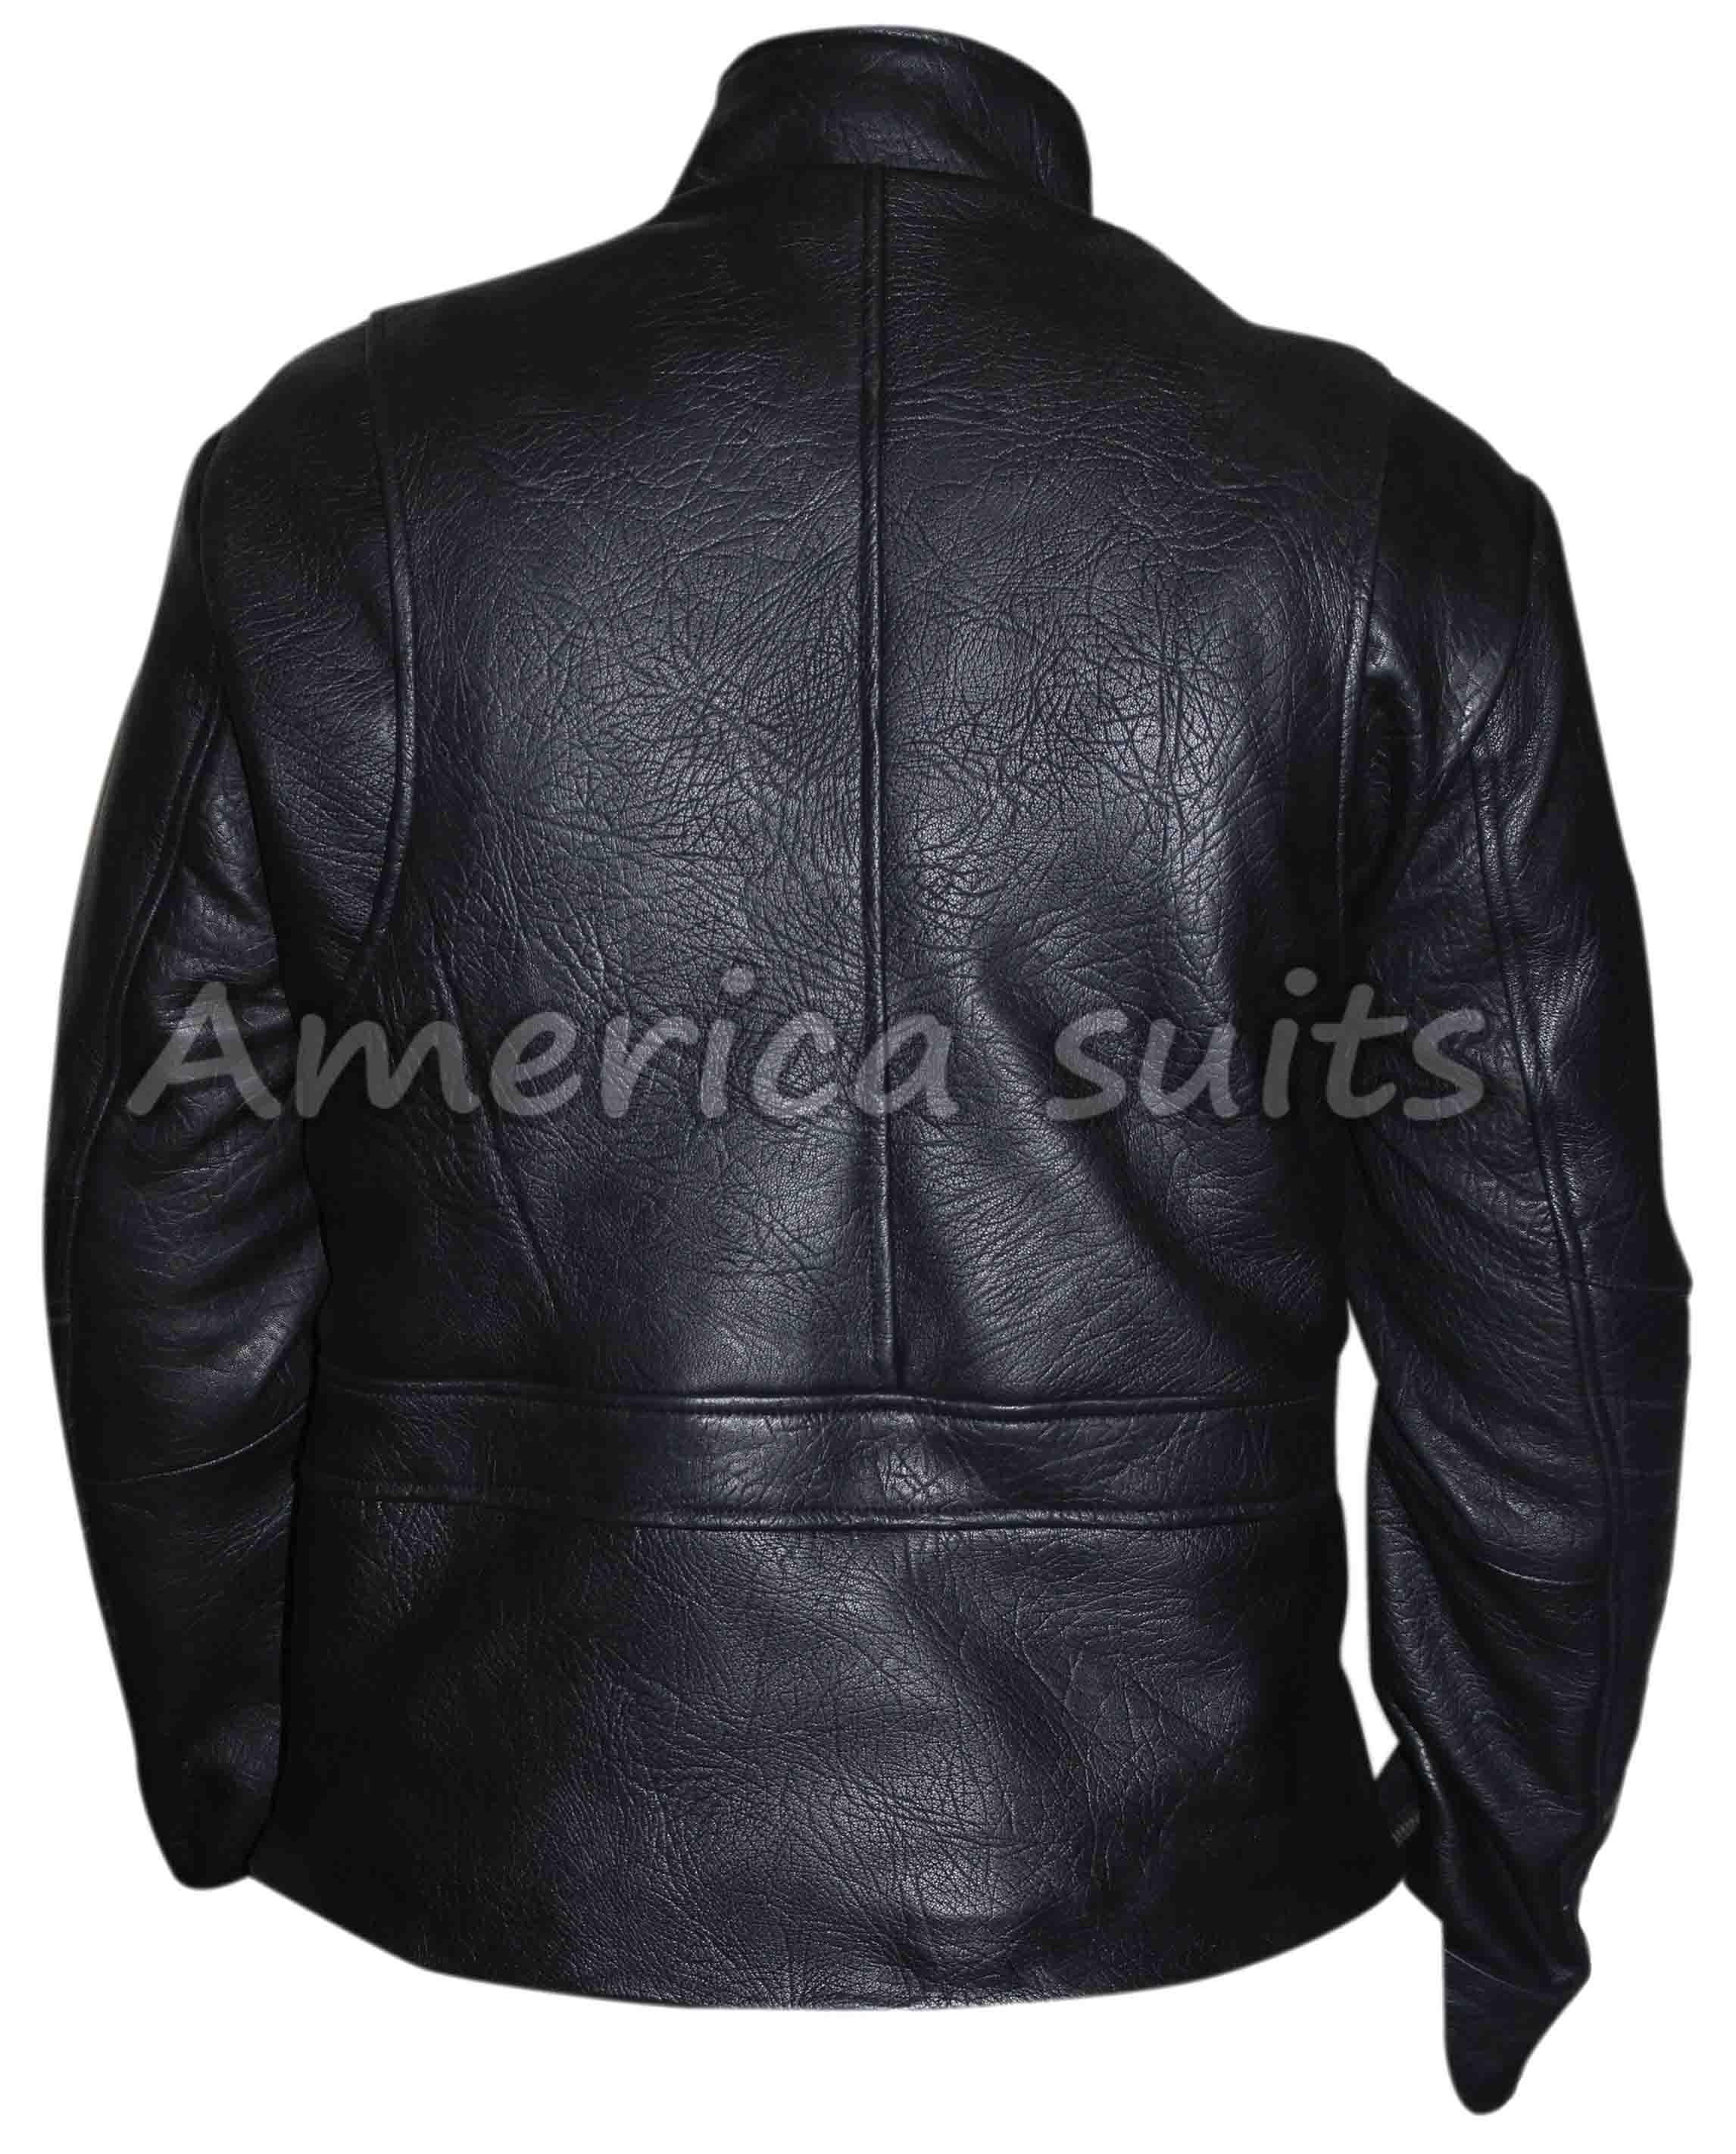 david-beckham-black-leather-jacket-500x500.JPG